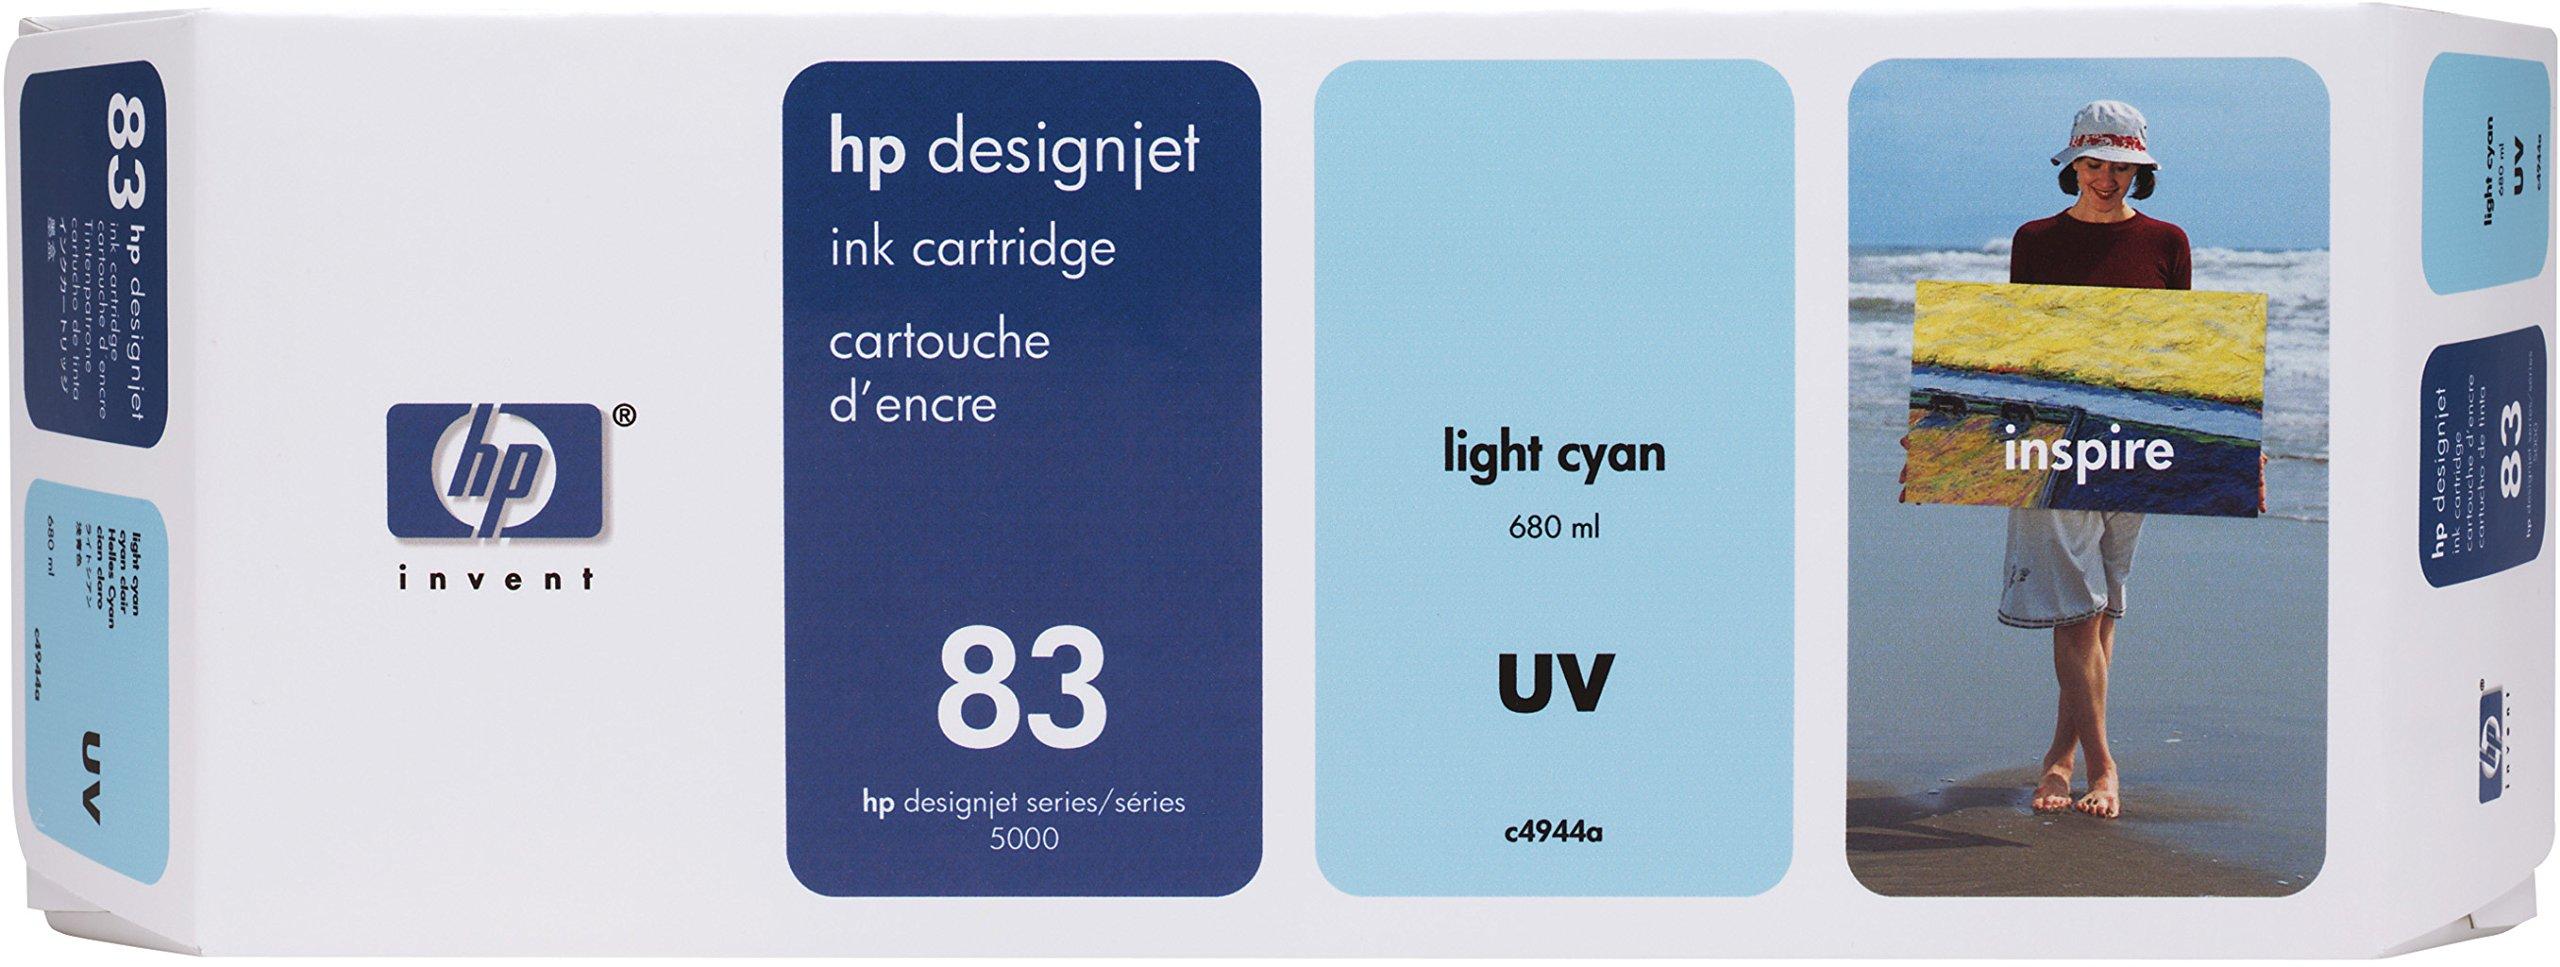 HP 83 C4944A UV Ink Cartridge for DesignJet 5000 series, 680ml, Light Cyan